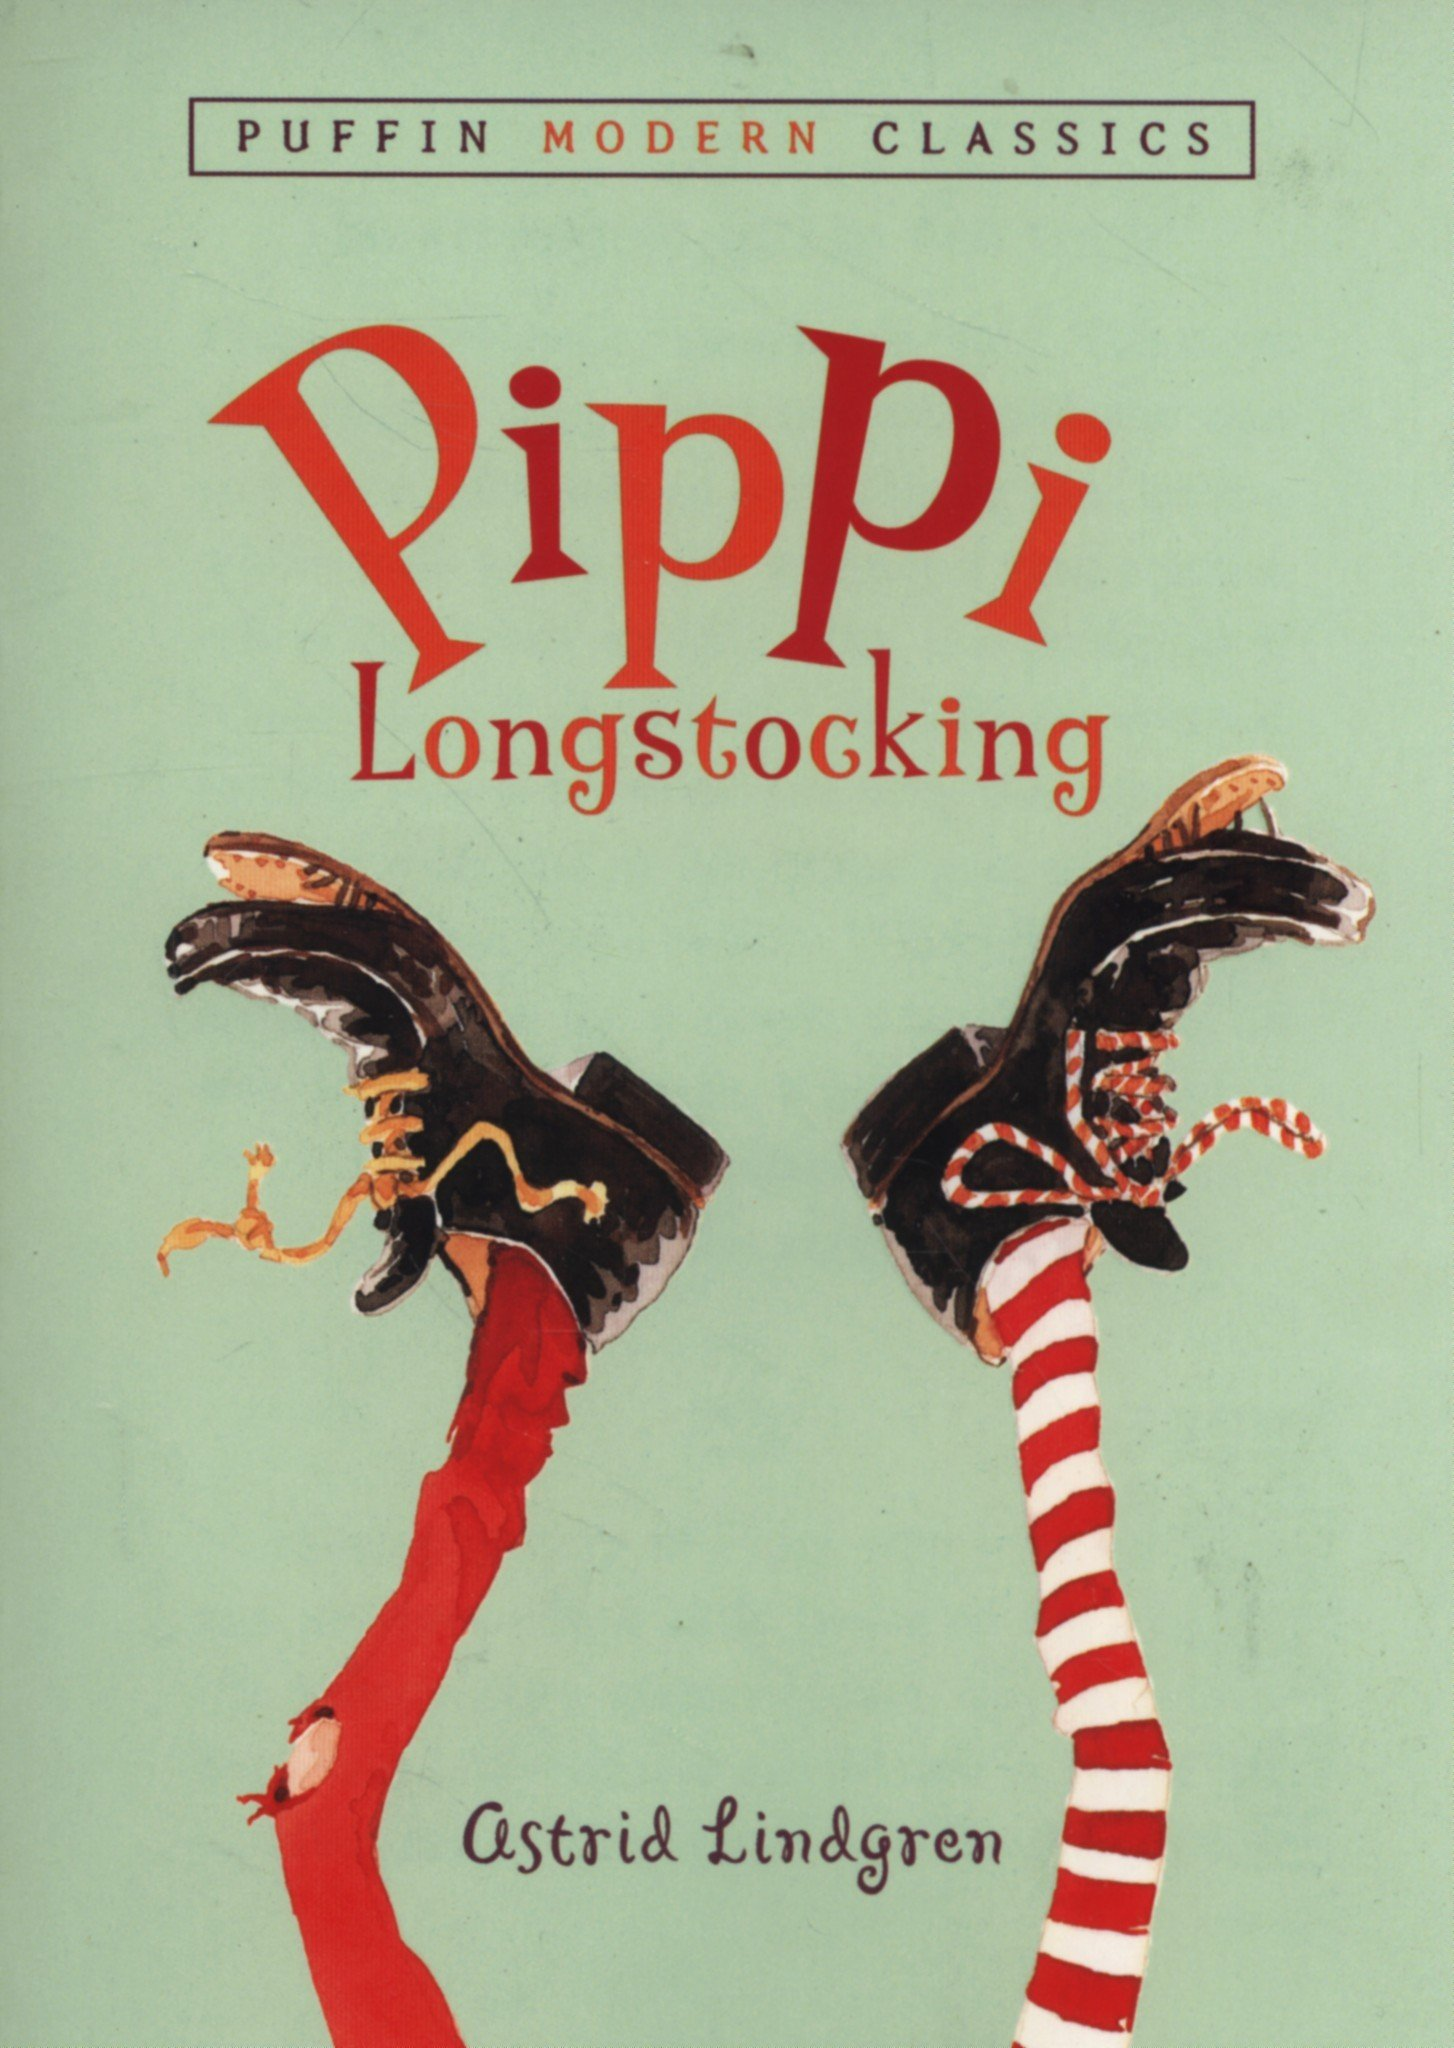 Pippi Longstocking by Astrid Lindgren. ages 7-10